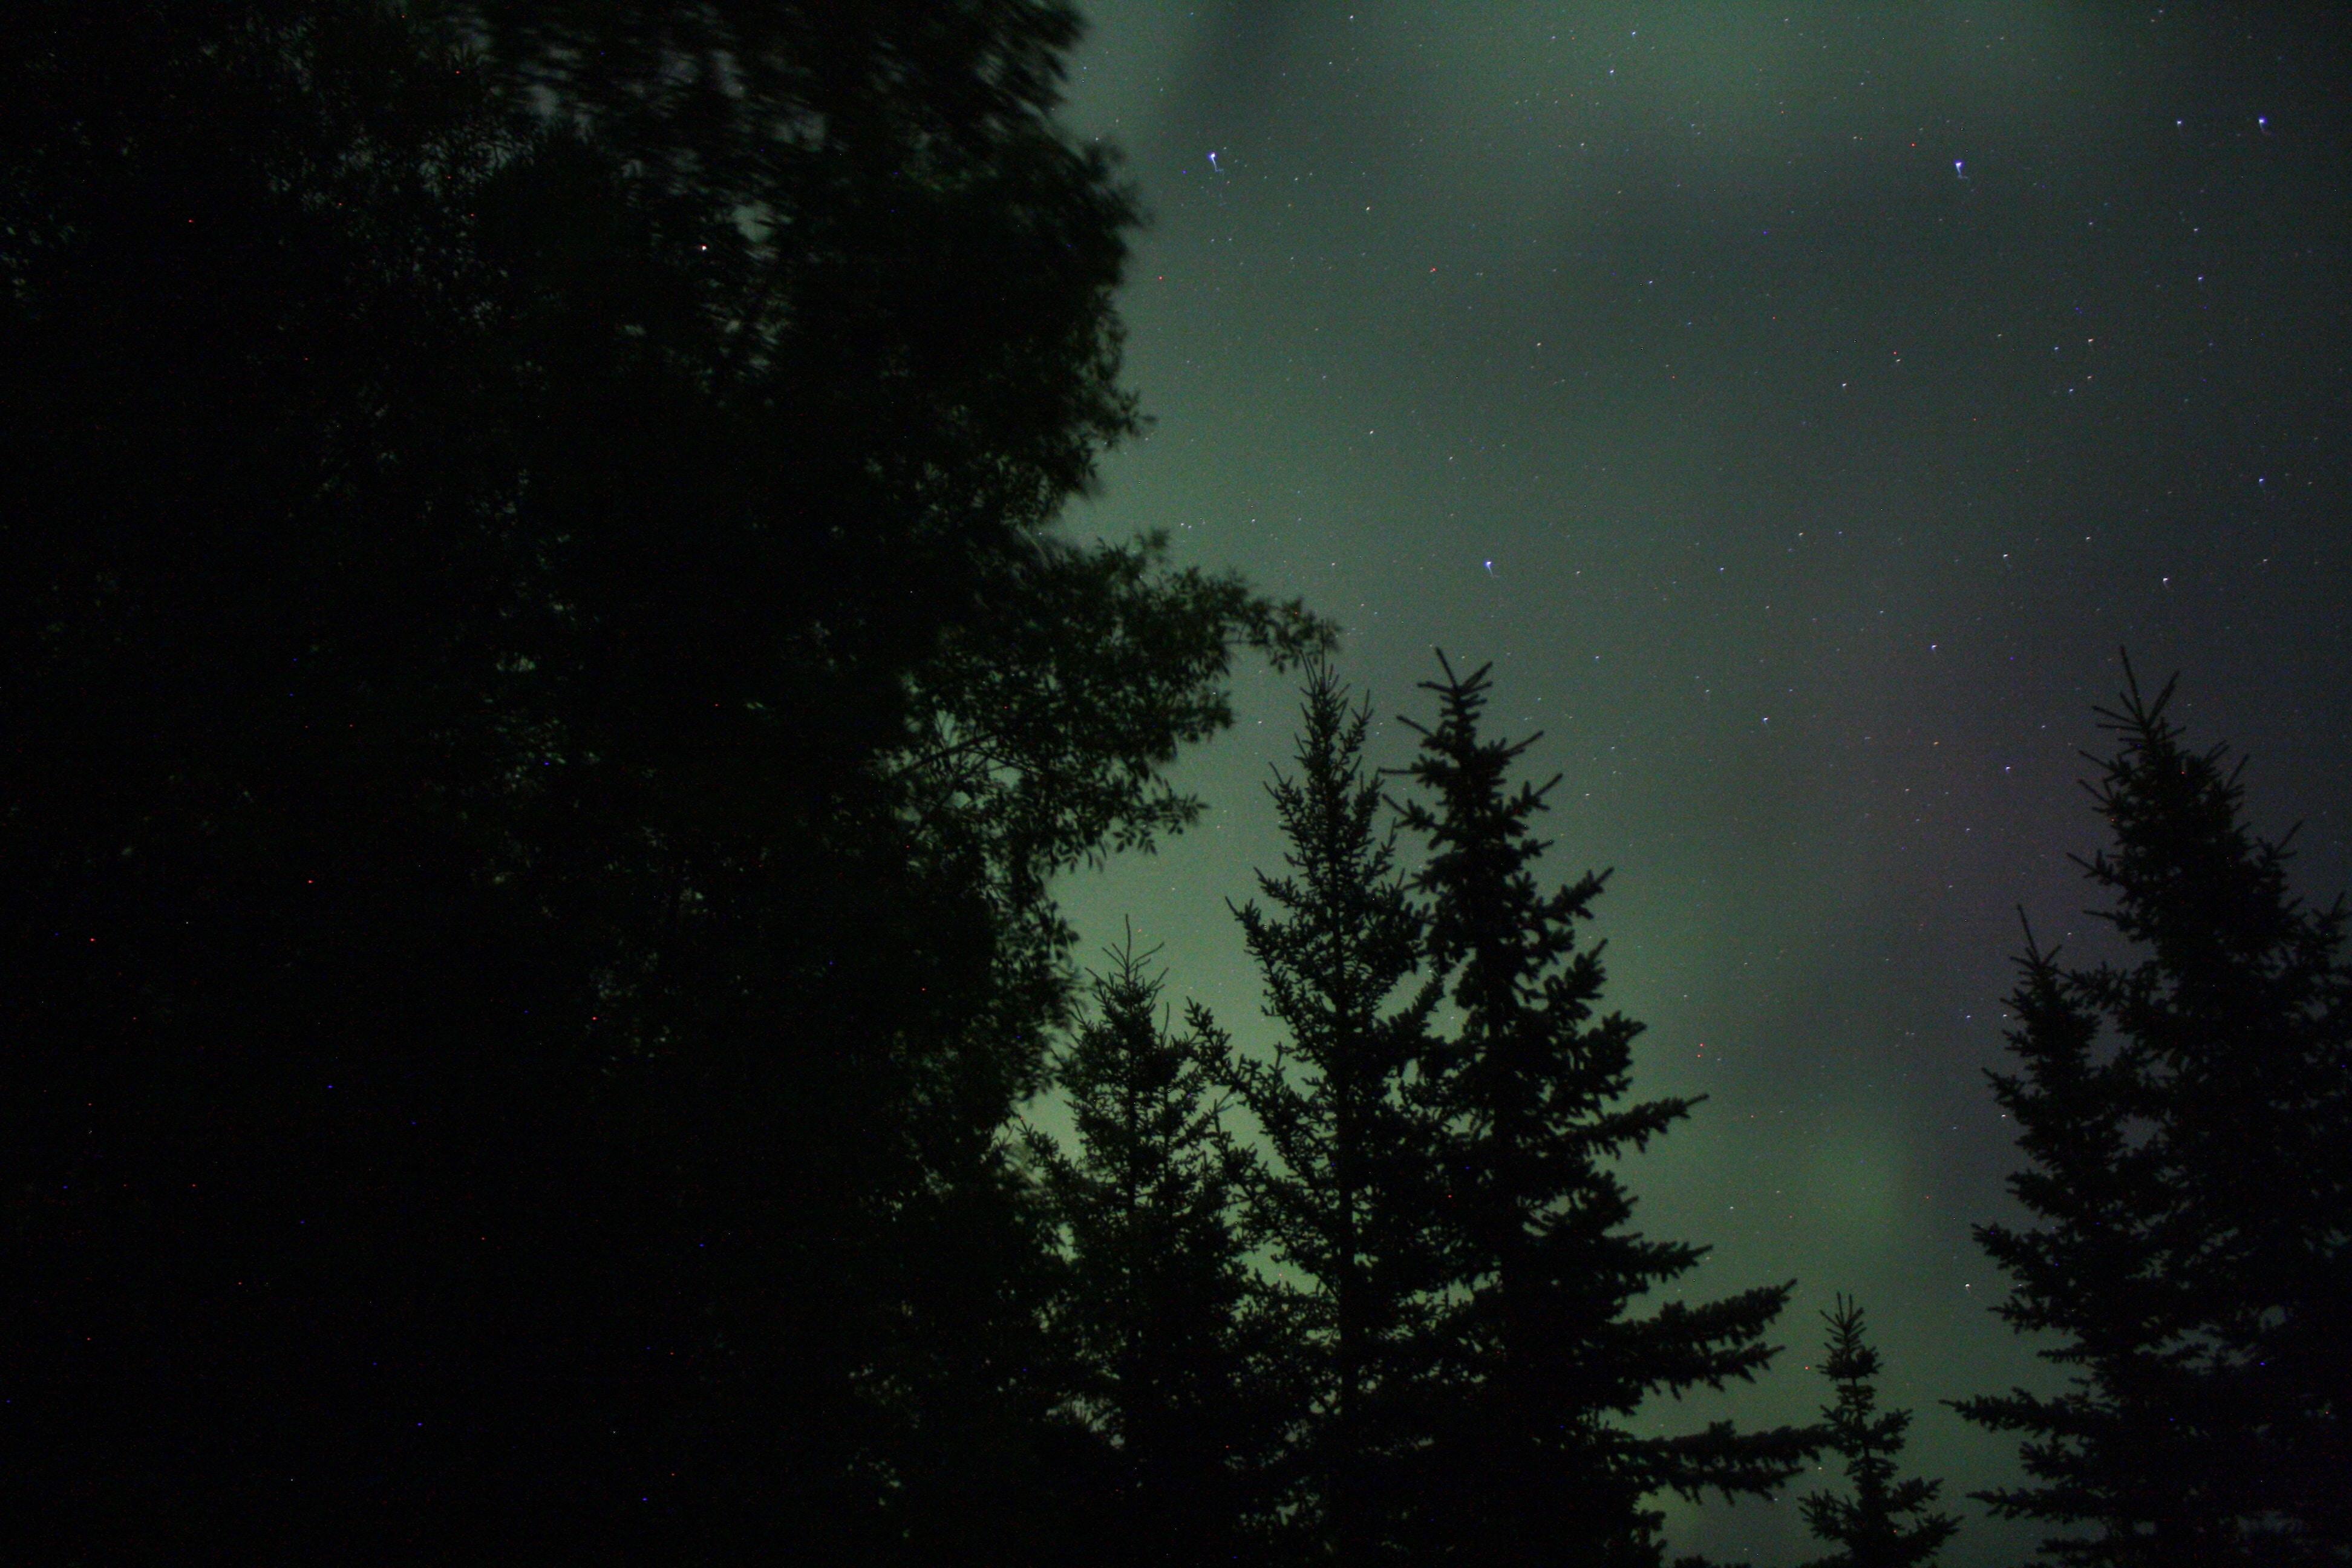 green trees under starry night